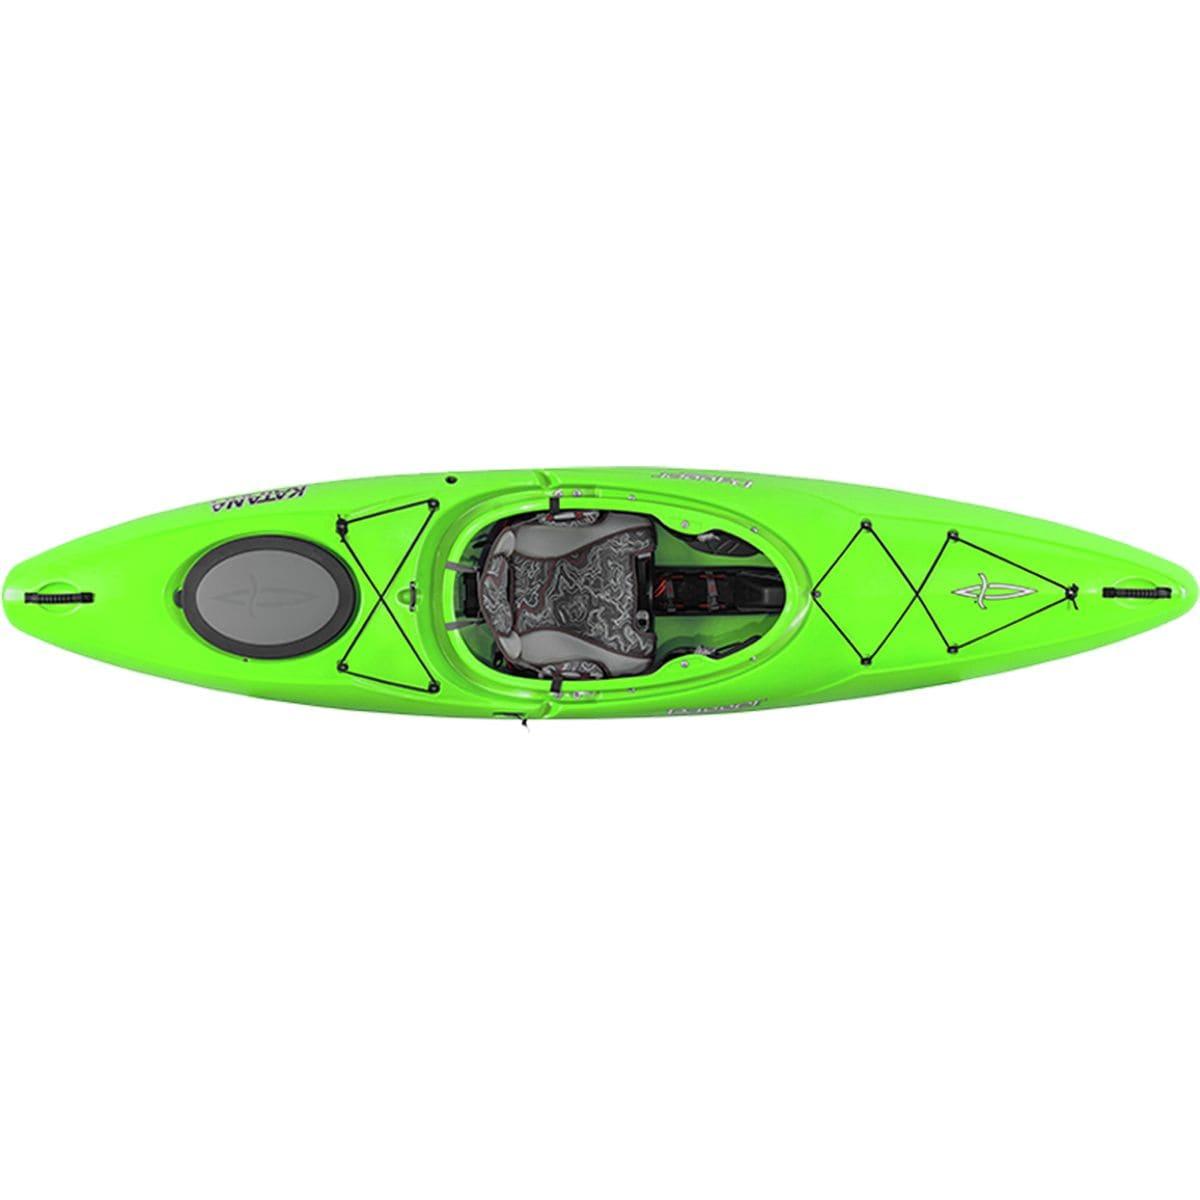 Dagger Katana 10.4 Kayak - 2019 Lime, One Size